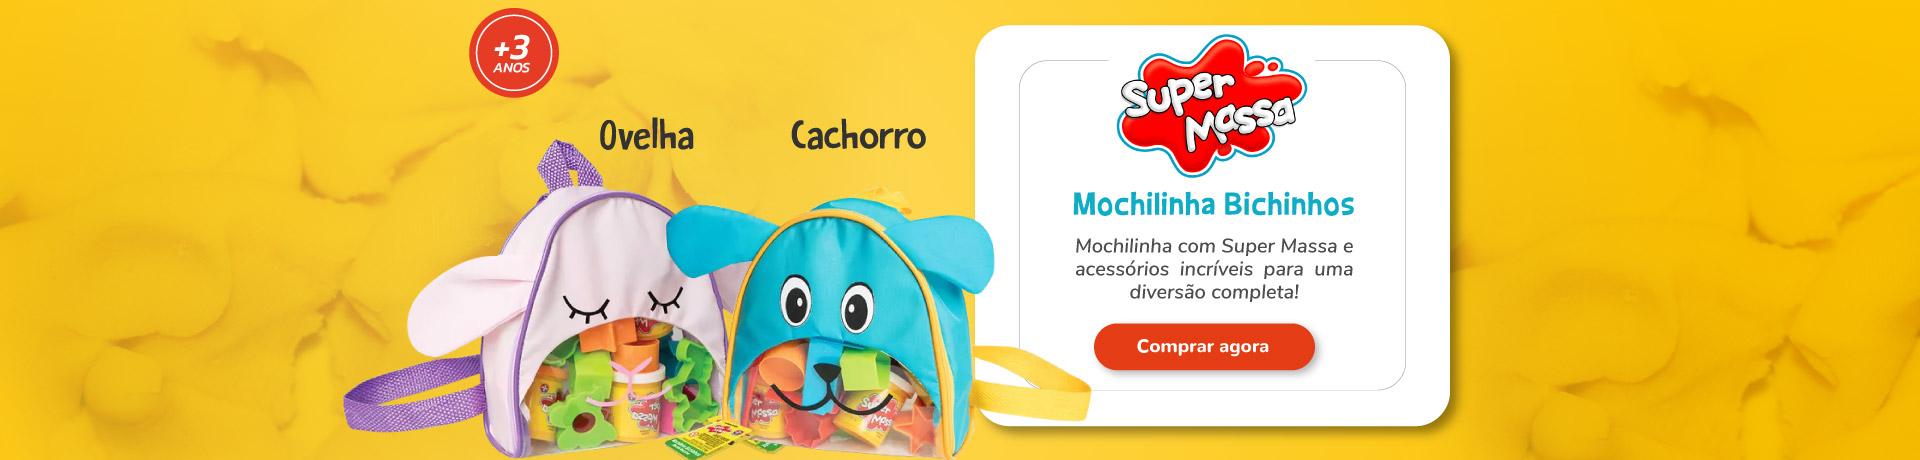 Super Massa Mochilinha Bichinhos